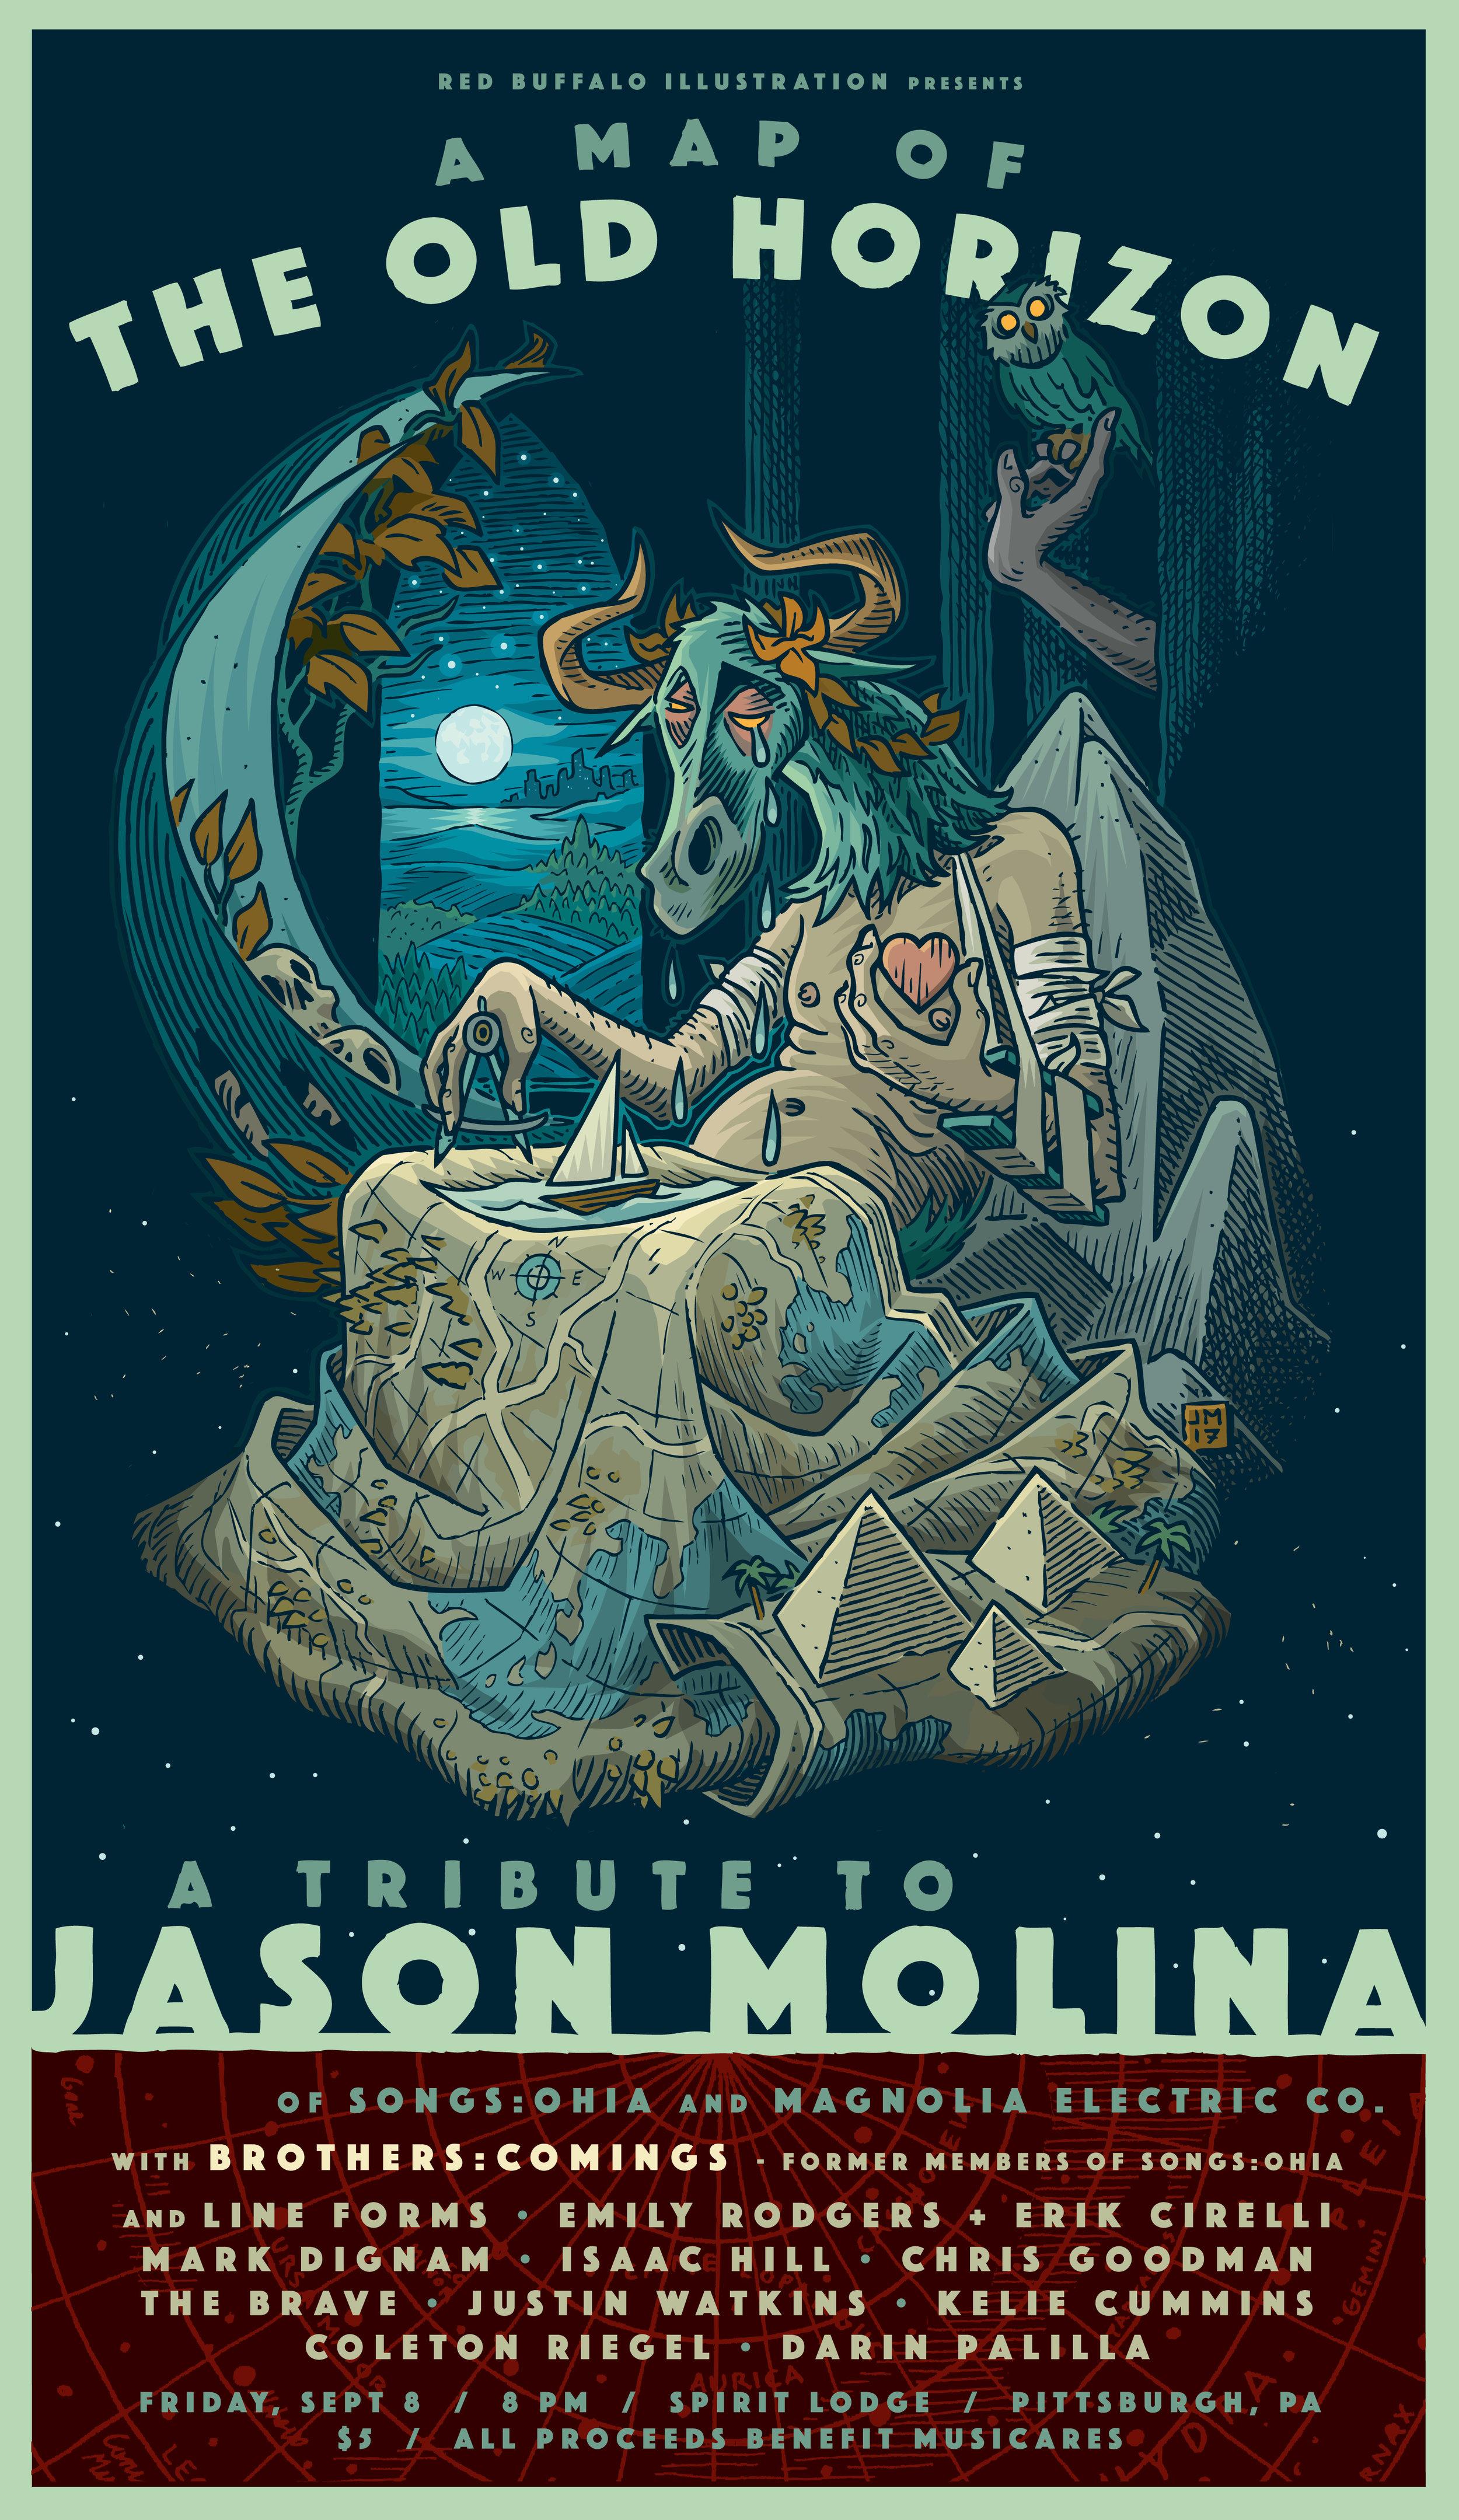 Jason Molina Tribute Show.jpg